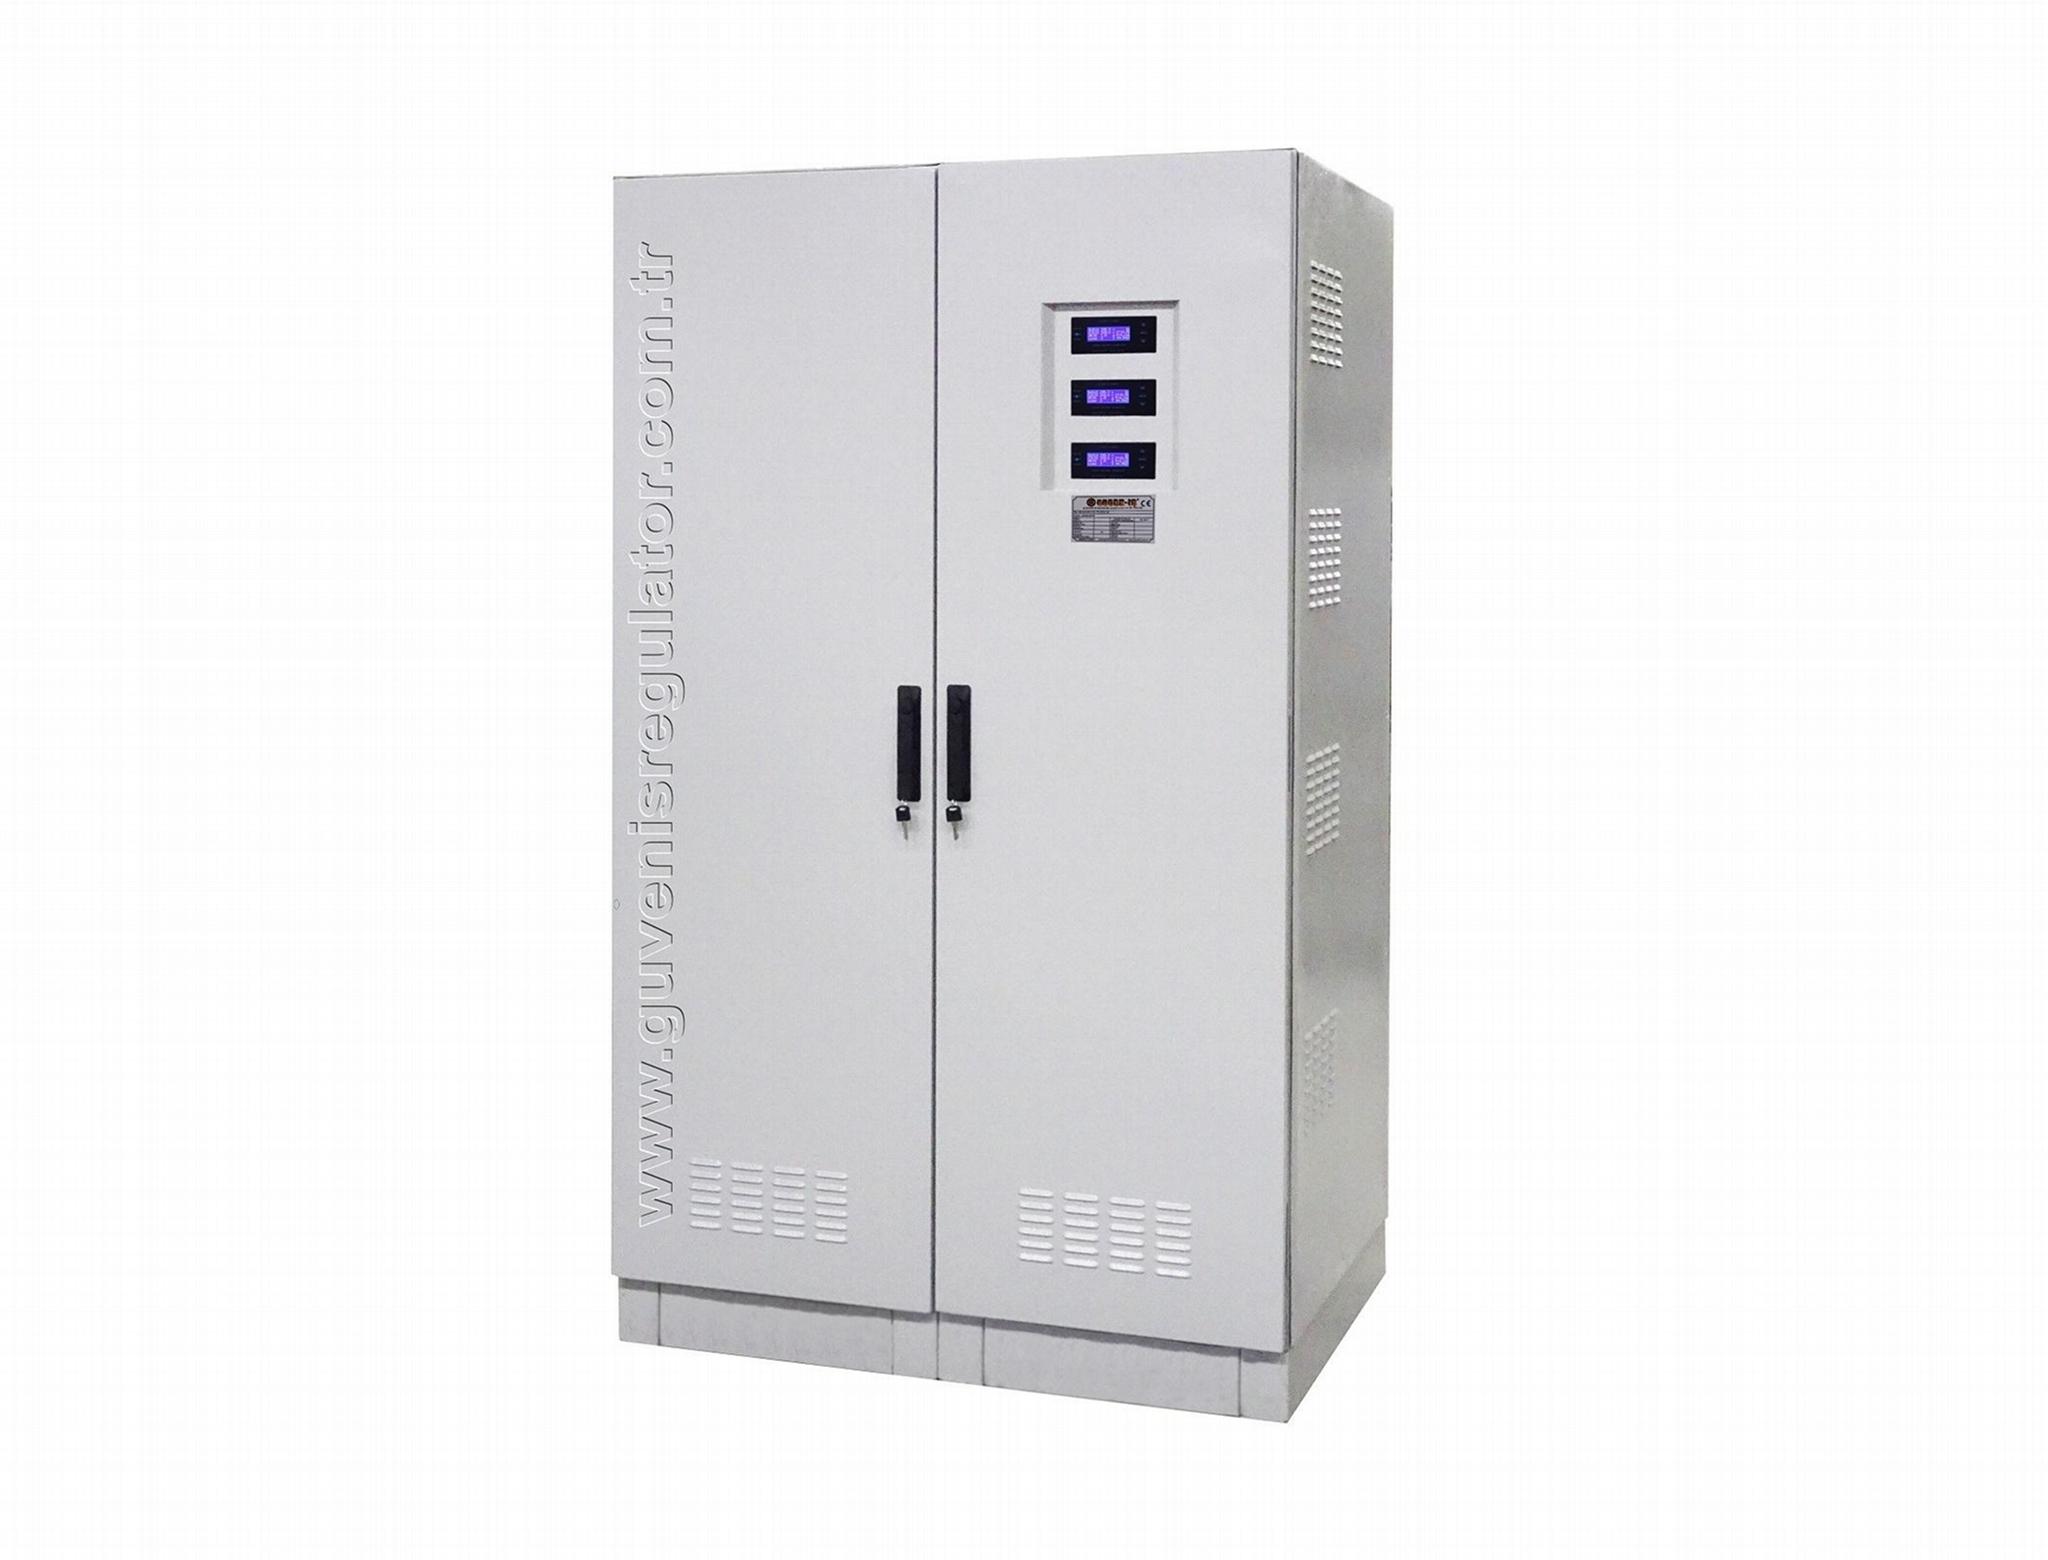 Static Voltage Stabilizer 3Phase 800KVA 1